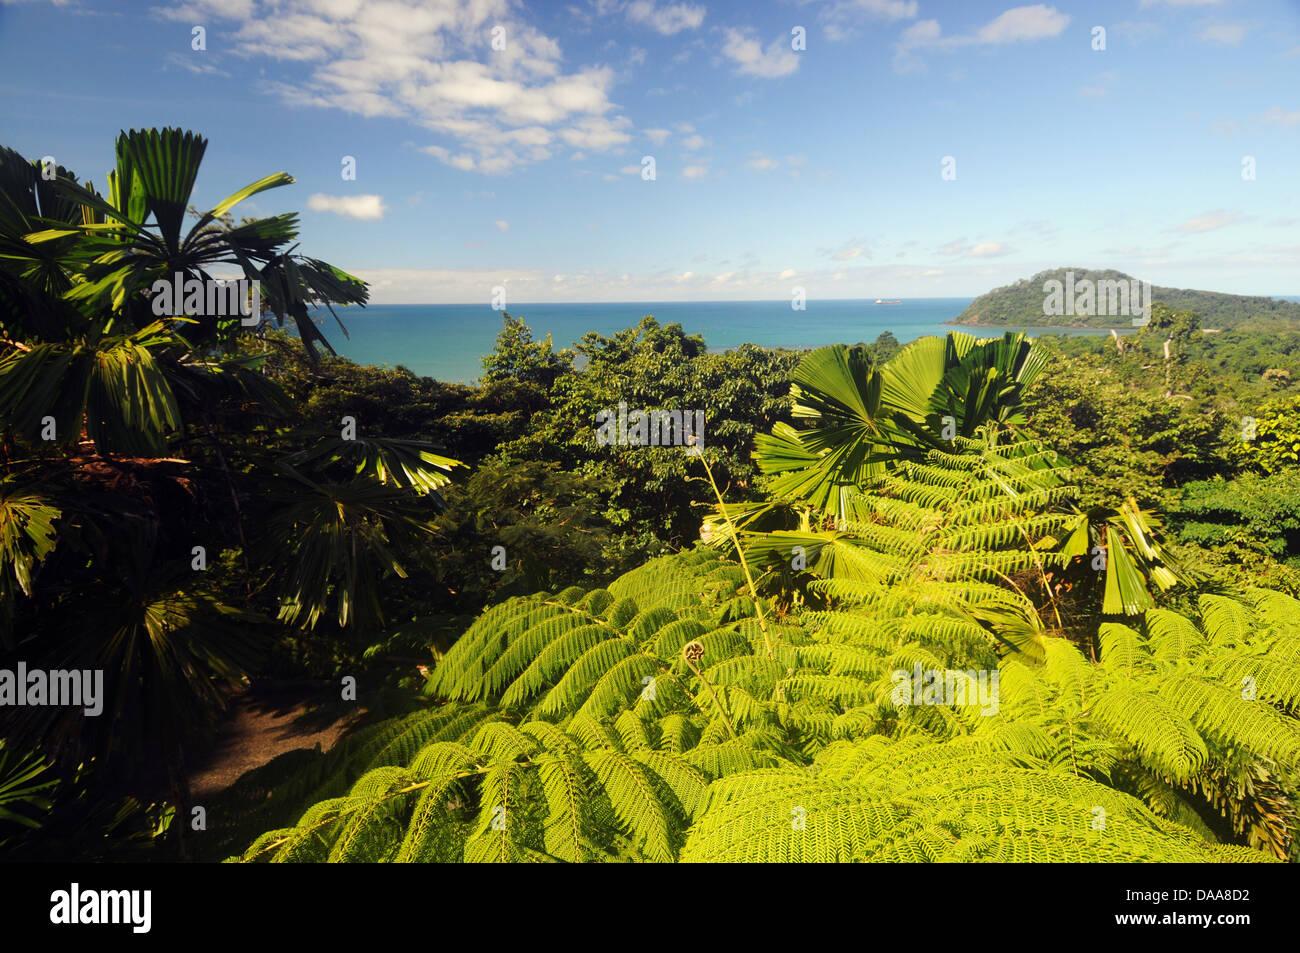 Regenwald, Cape Tribulation und der Coral Sea, Daintree Nationalpark, Wet Tropics World Heritage Area, Australien Stockbild